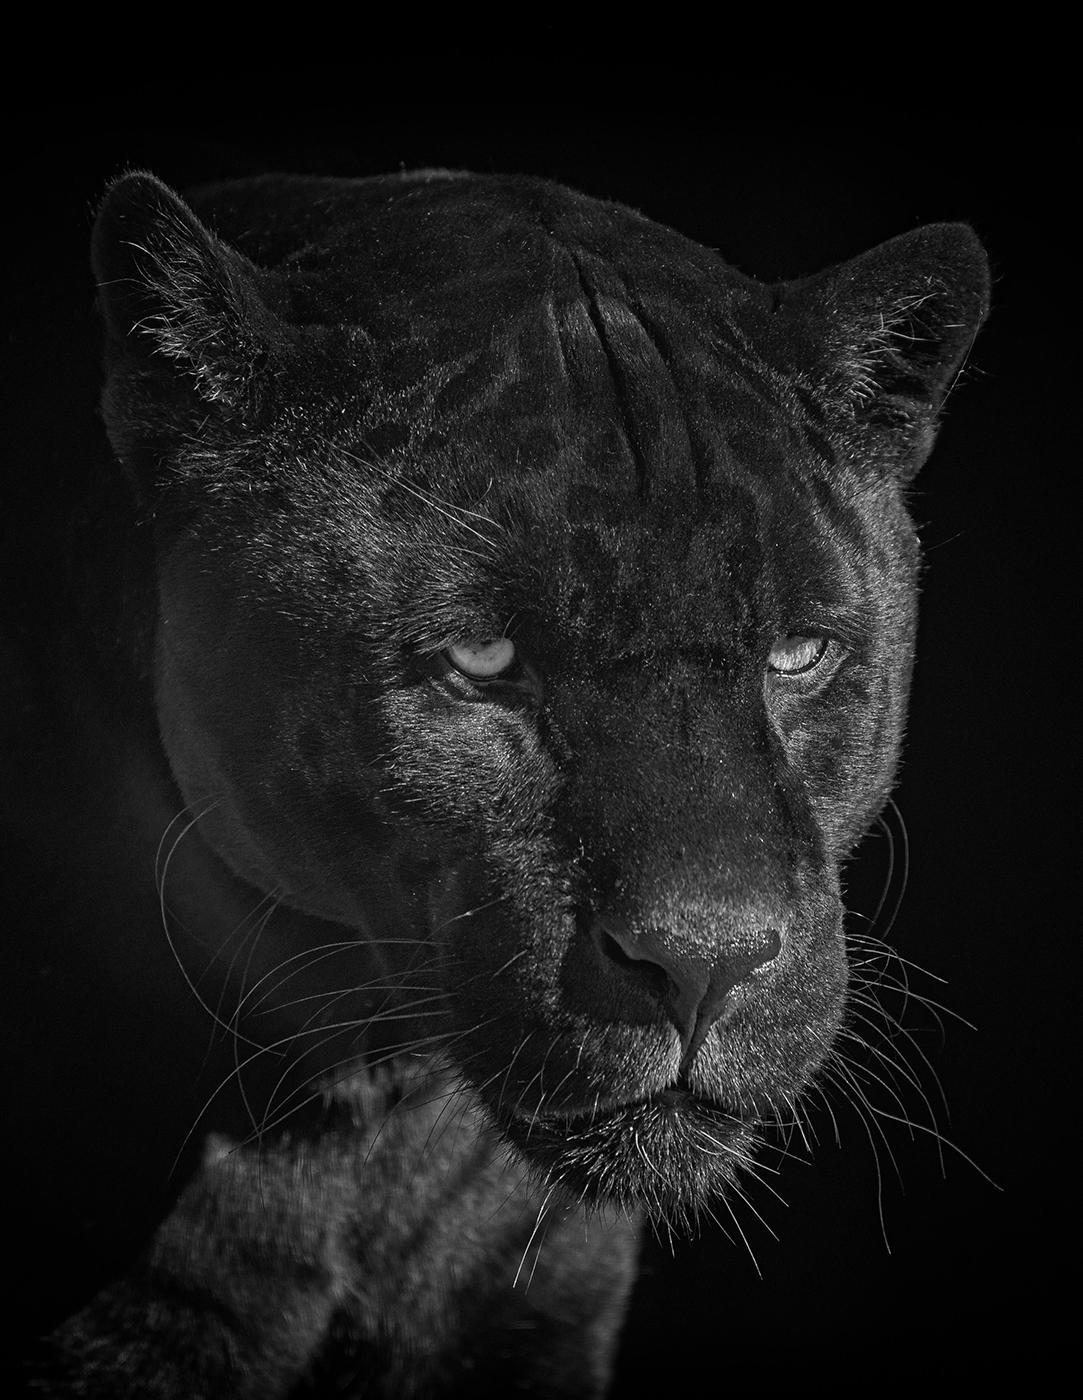 <h5>Jaguar</h5><p>Monochrome Print by Steve Bancroft</p>